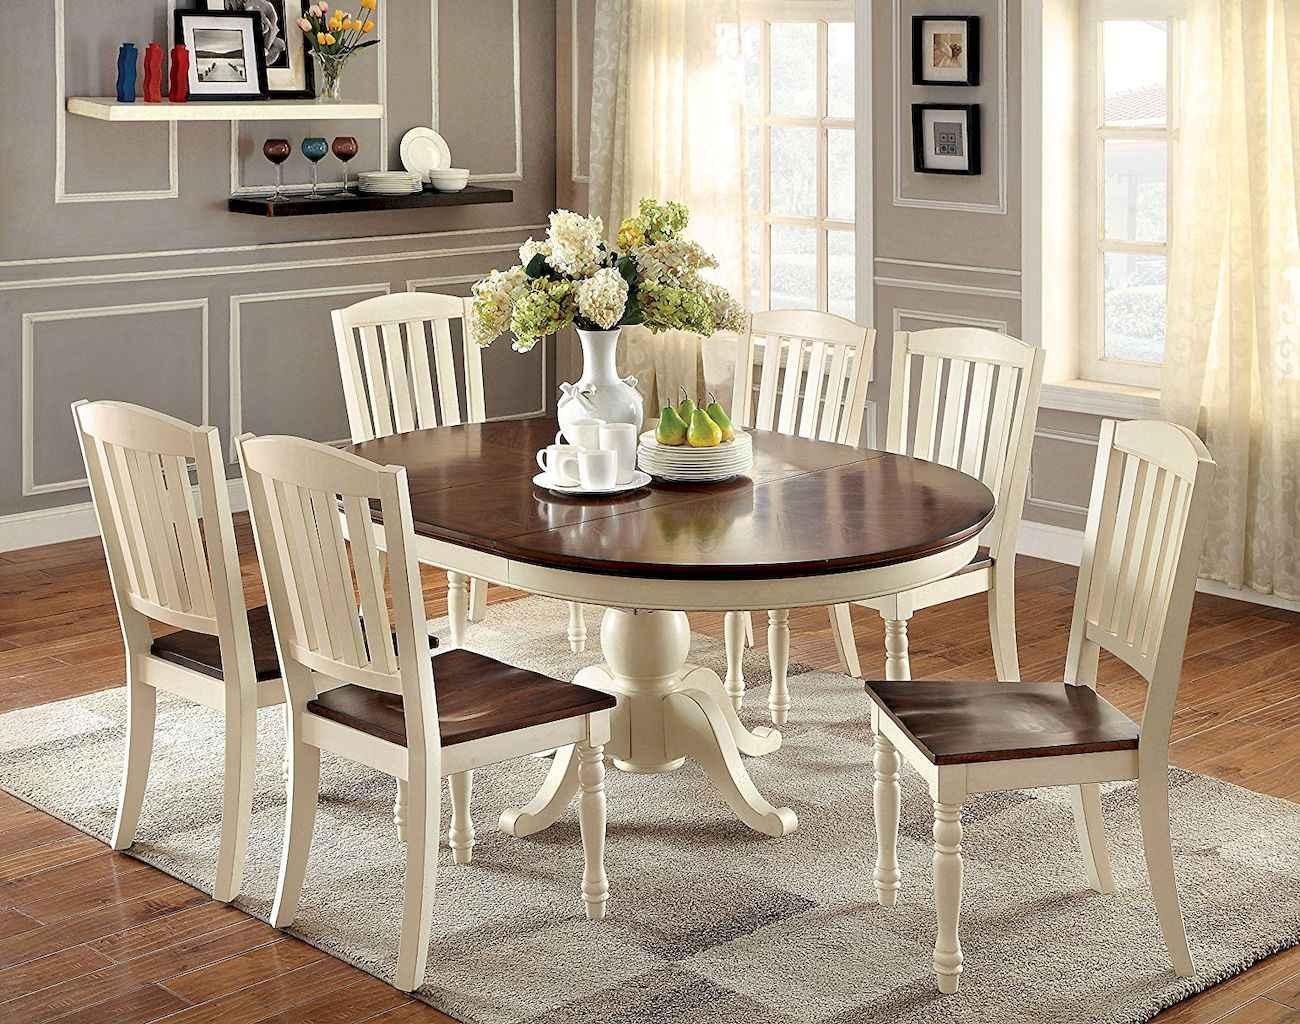 100 Rustic Farmhouse Dining Room Decor Ideas (15)